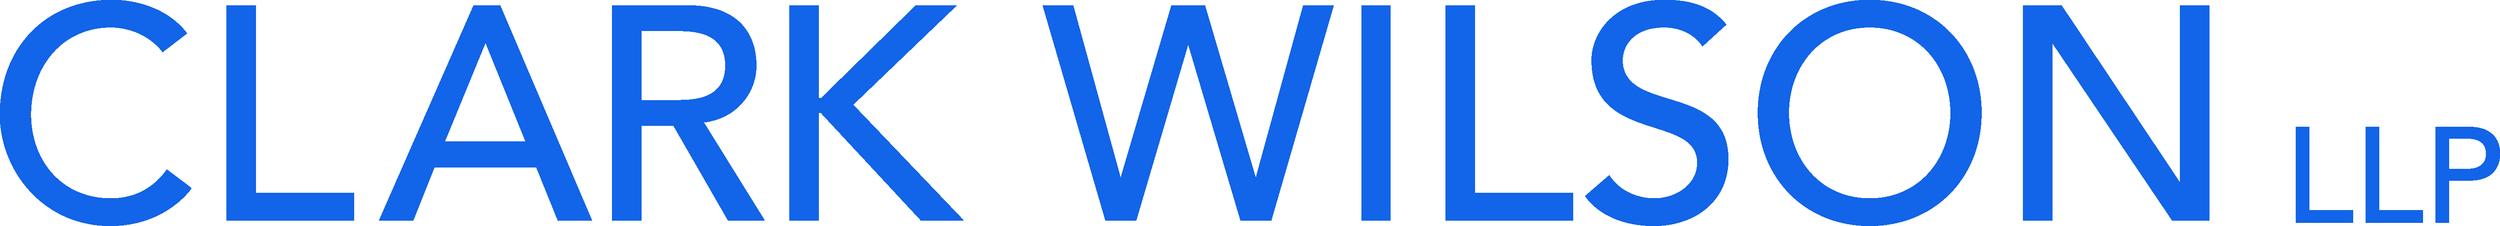 cw-logo-hires.jpeg